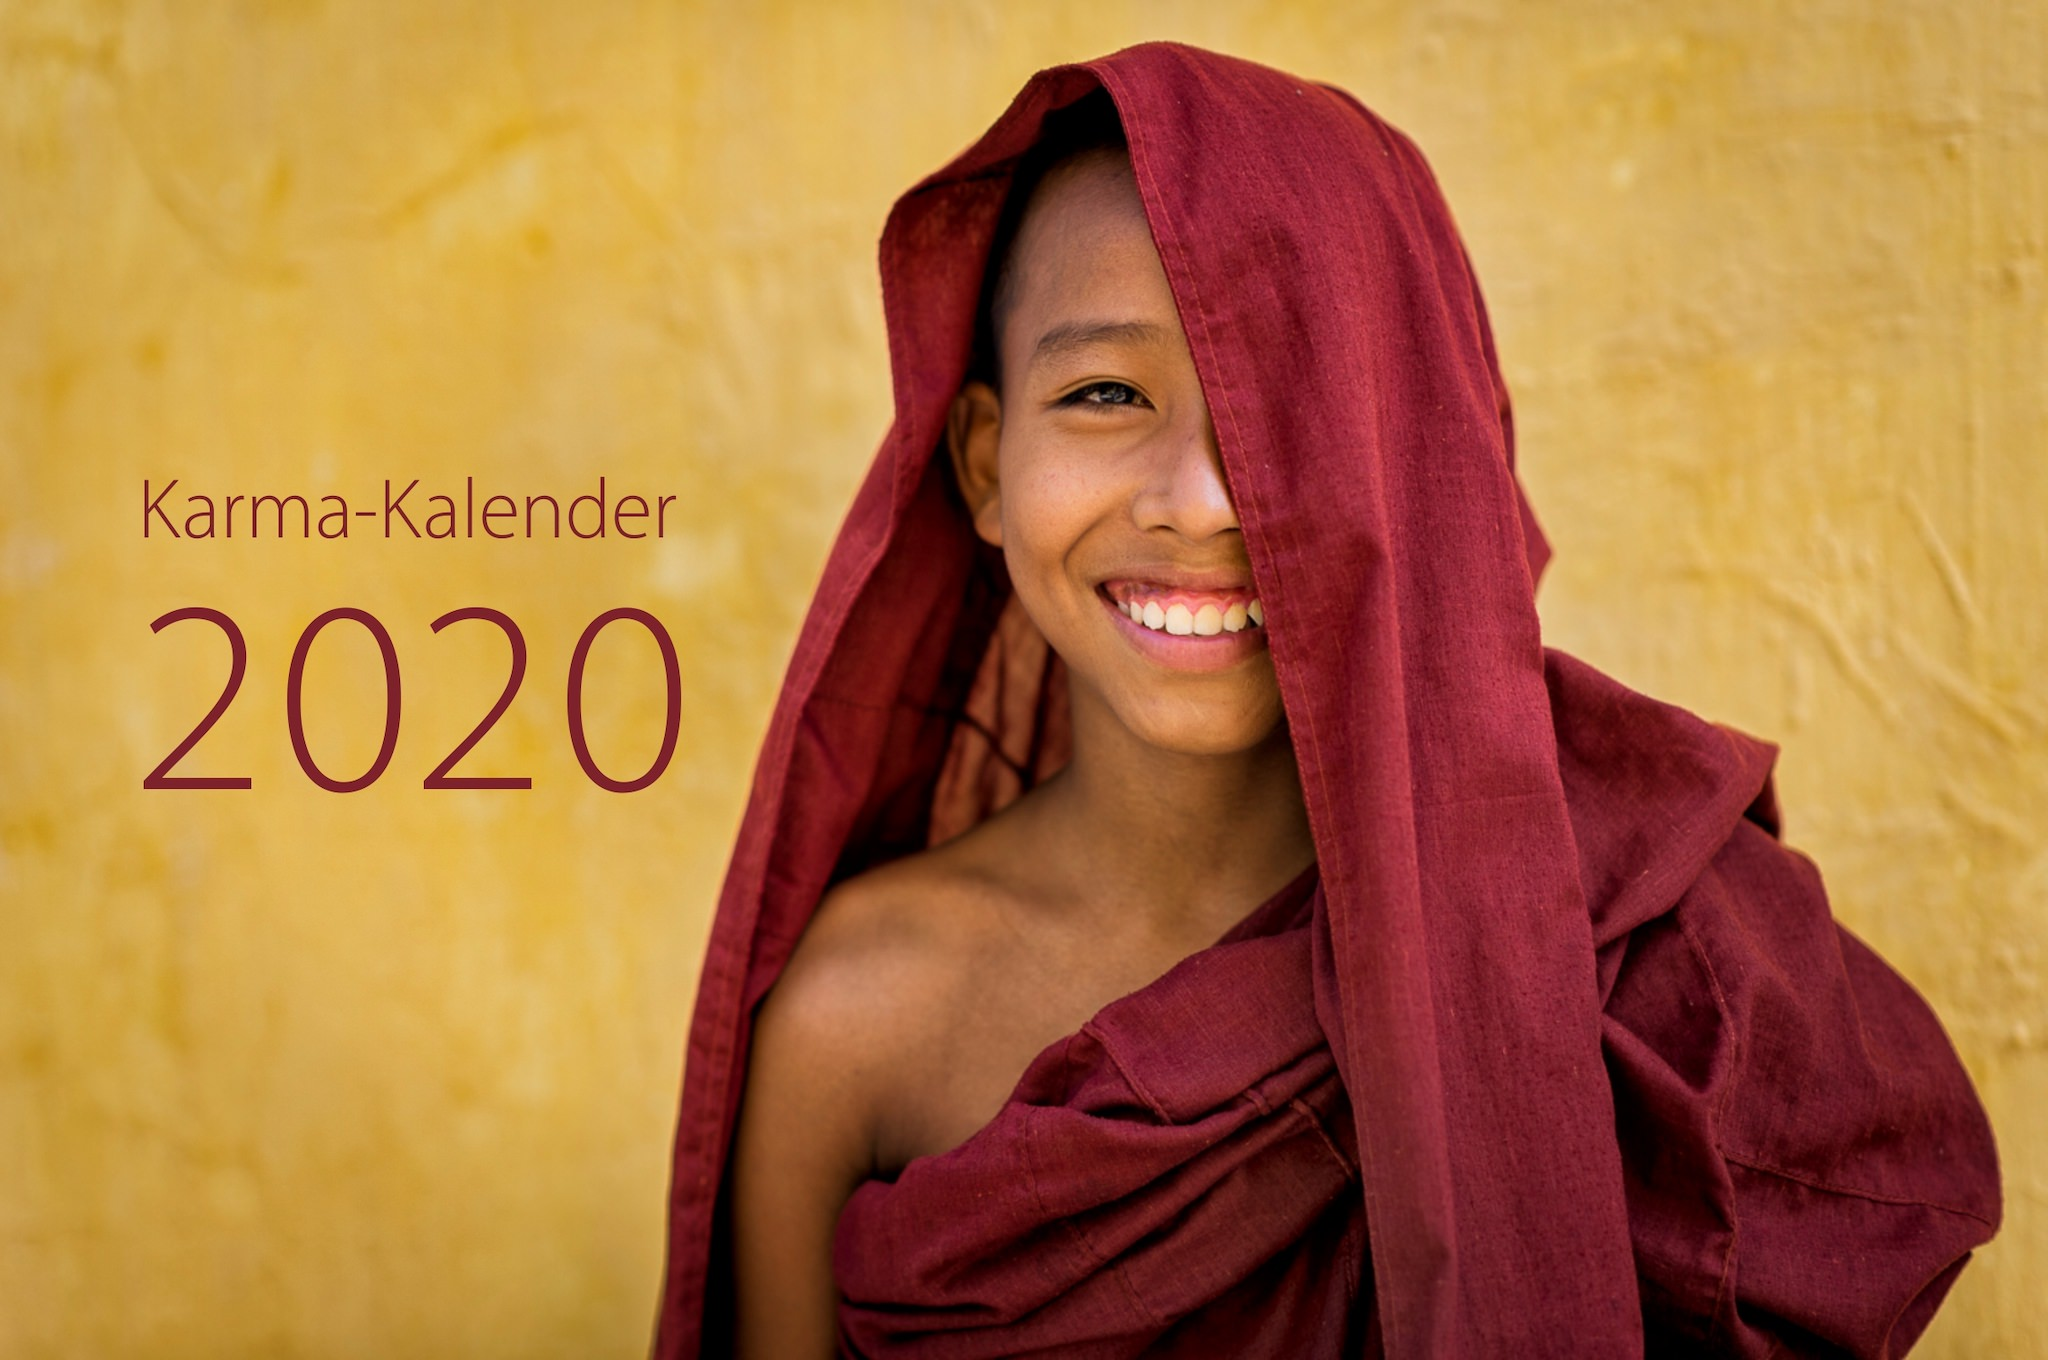 Karma-Kalender 2020